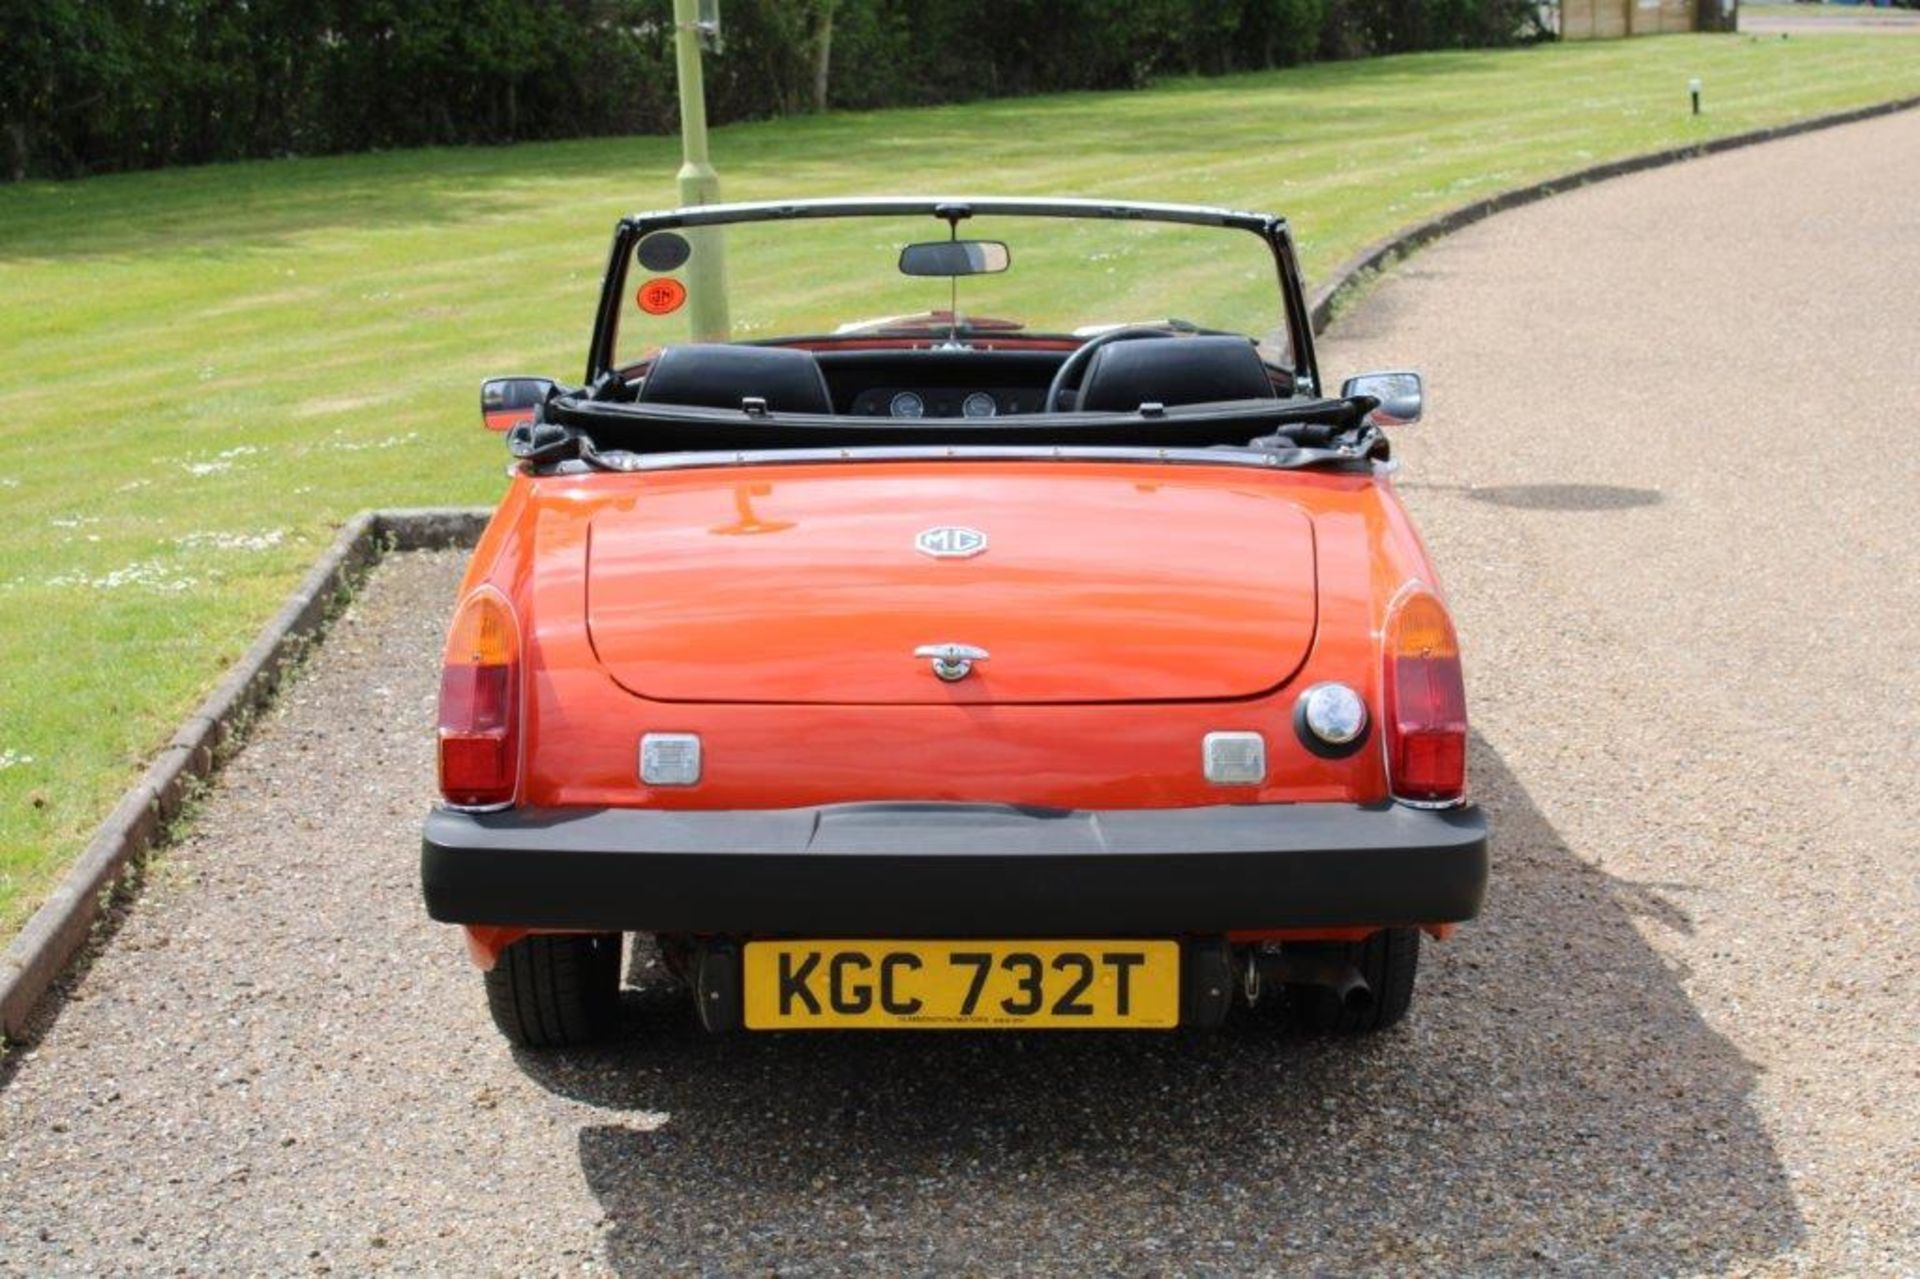 1979 MG Midget 1500 - Image 9 of 37